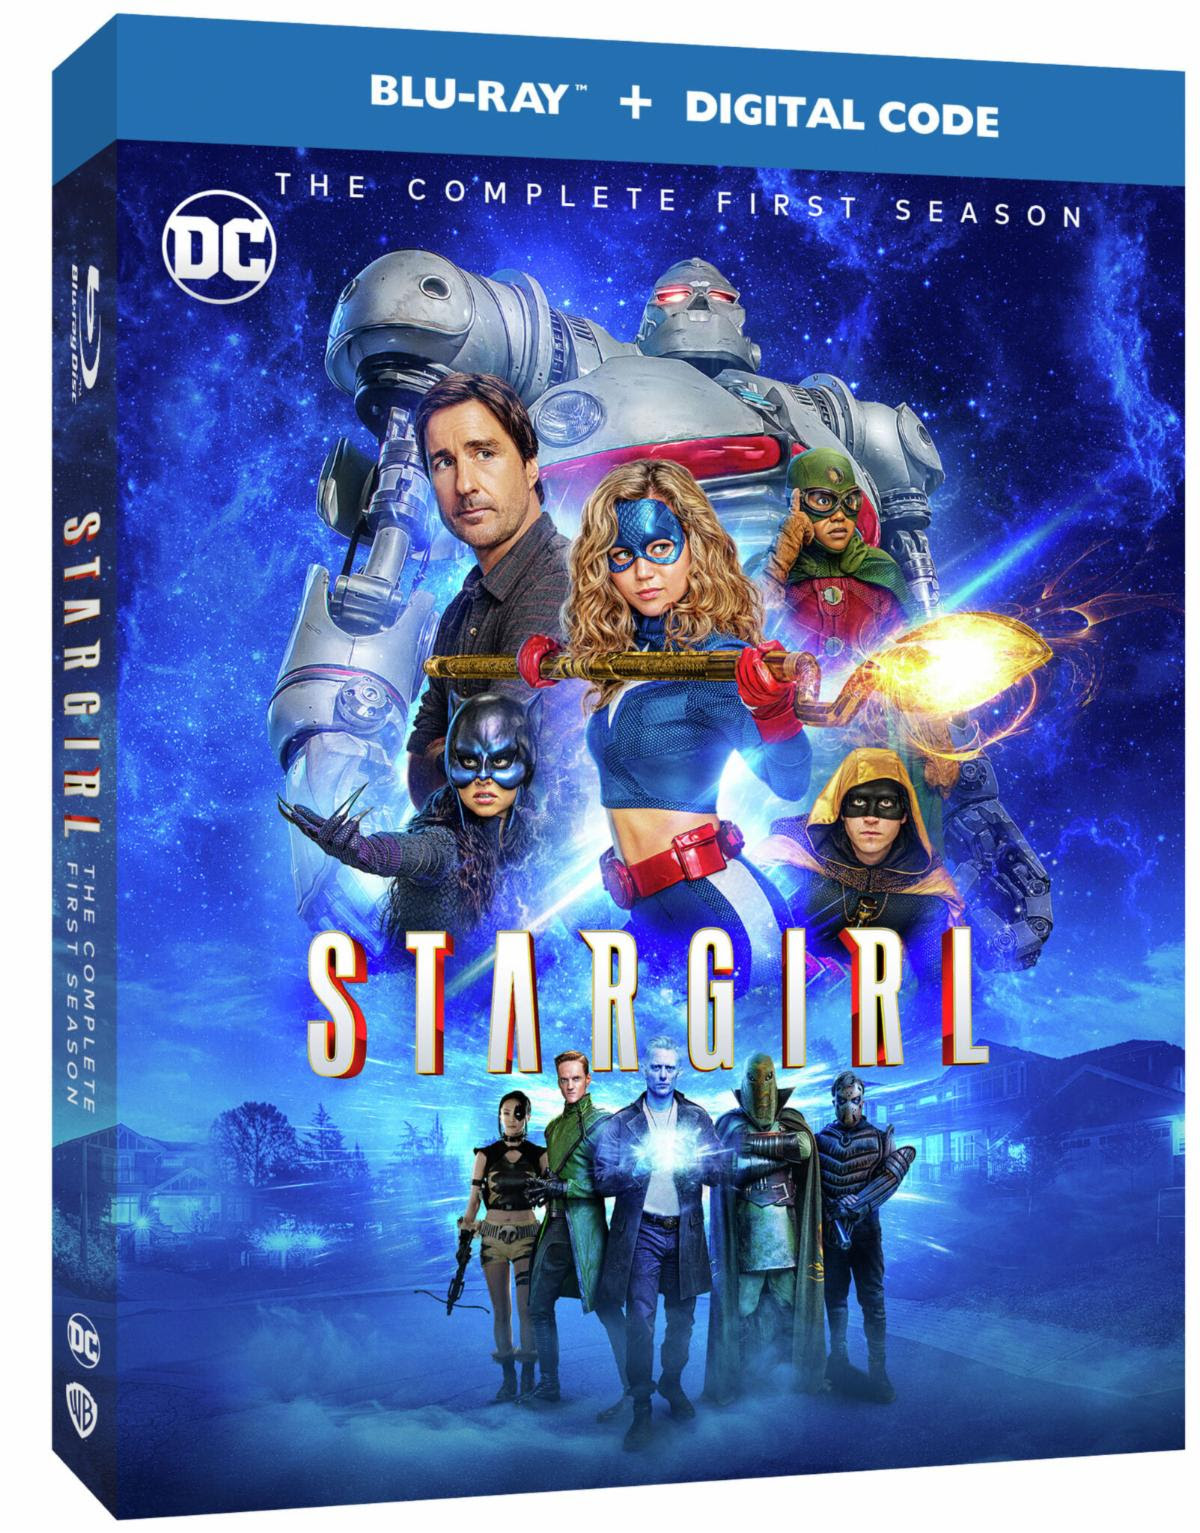 4 Reasons To Watch DC's Stargirl